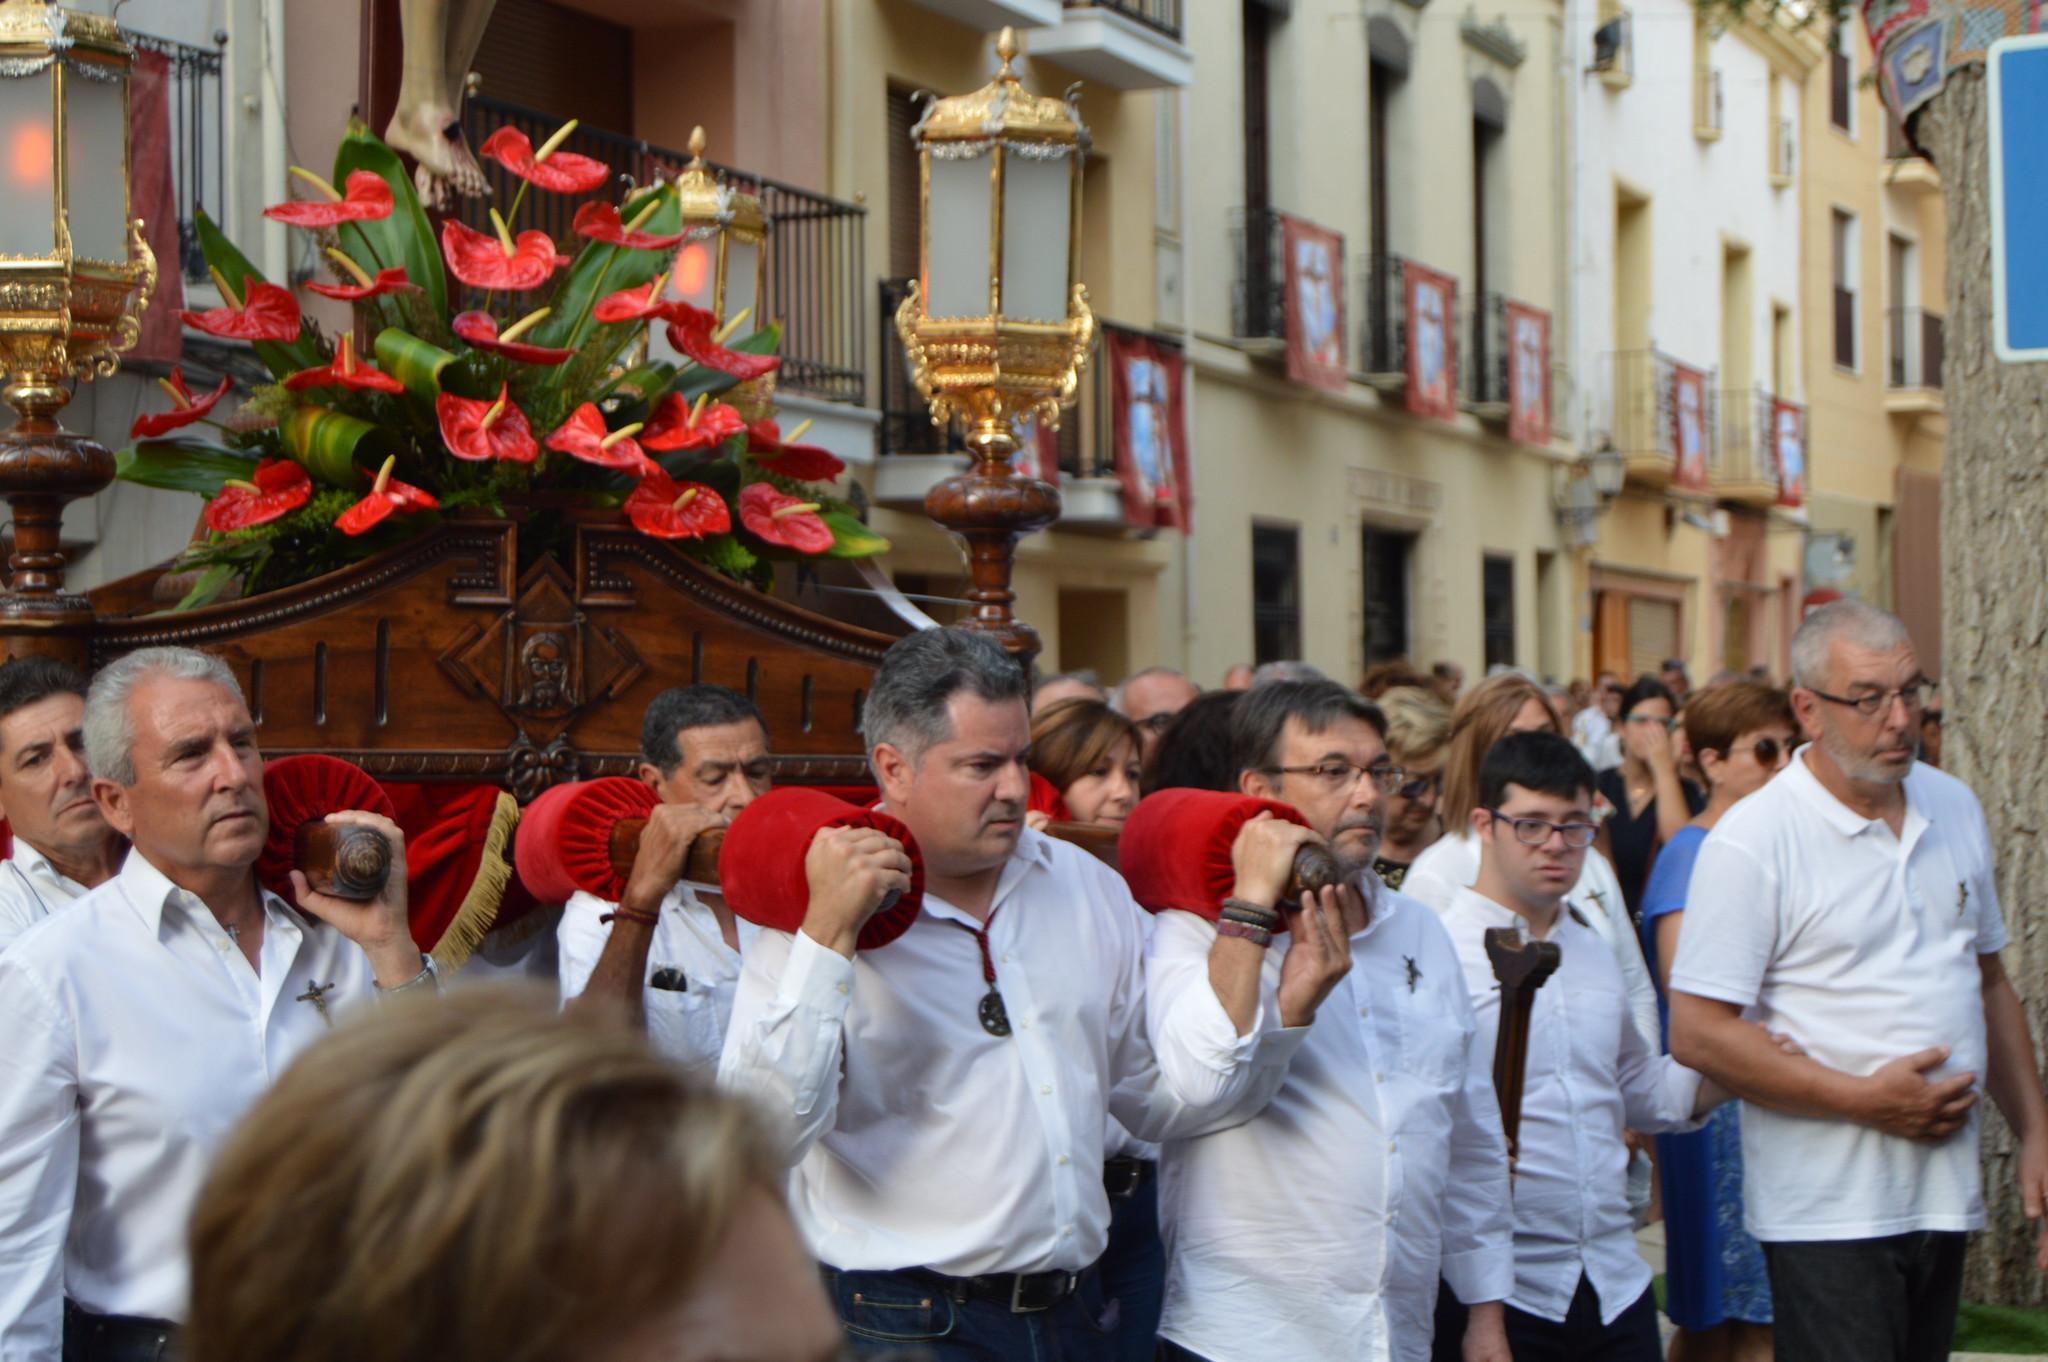 (2019-07-07) Procesión de subida - Adrián Romero Montesinos (05)